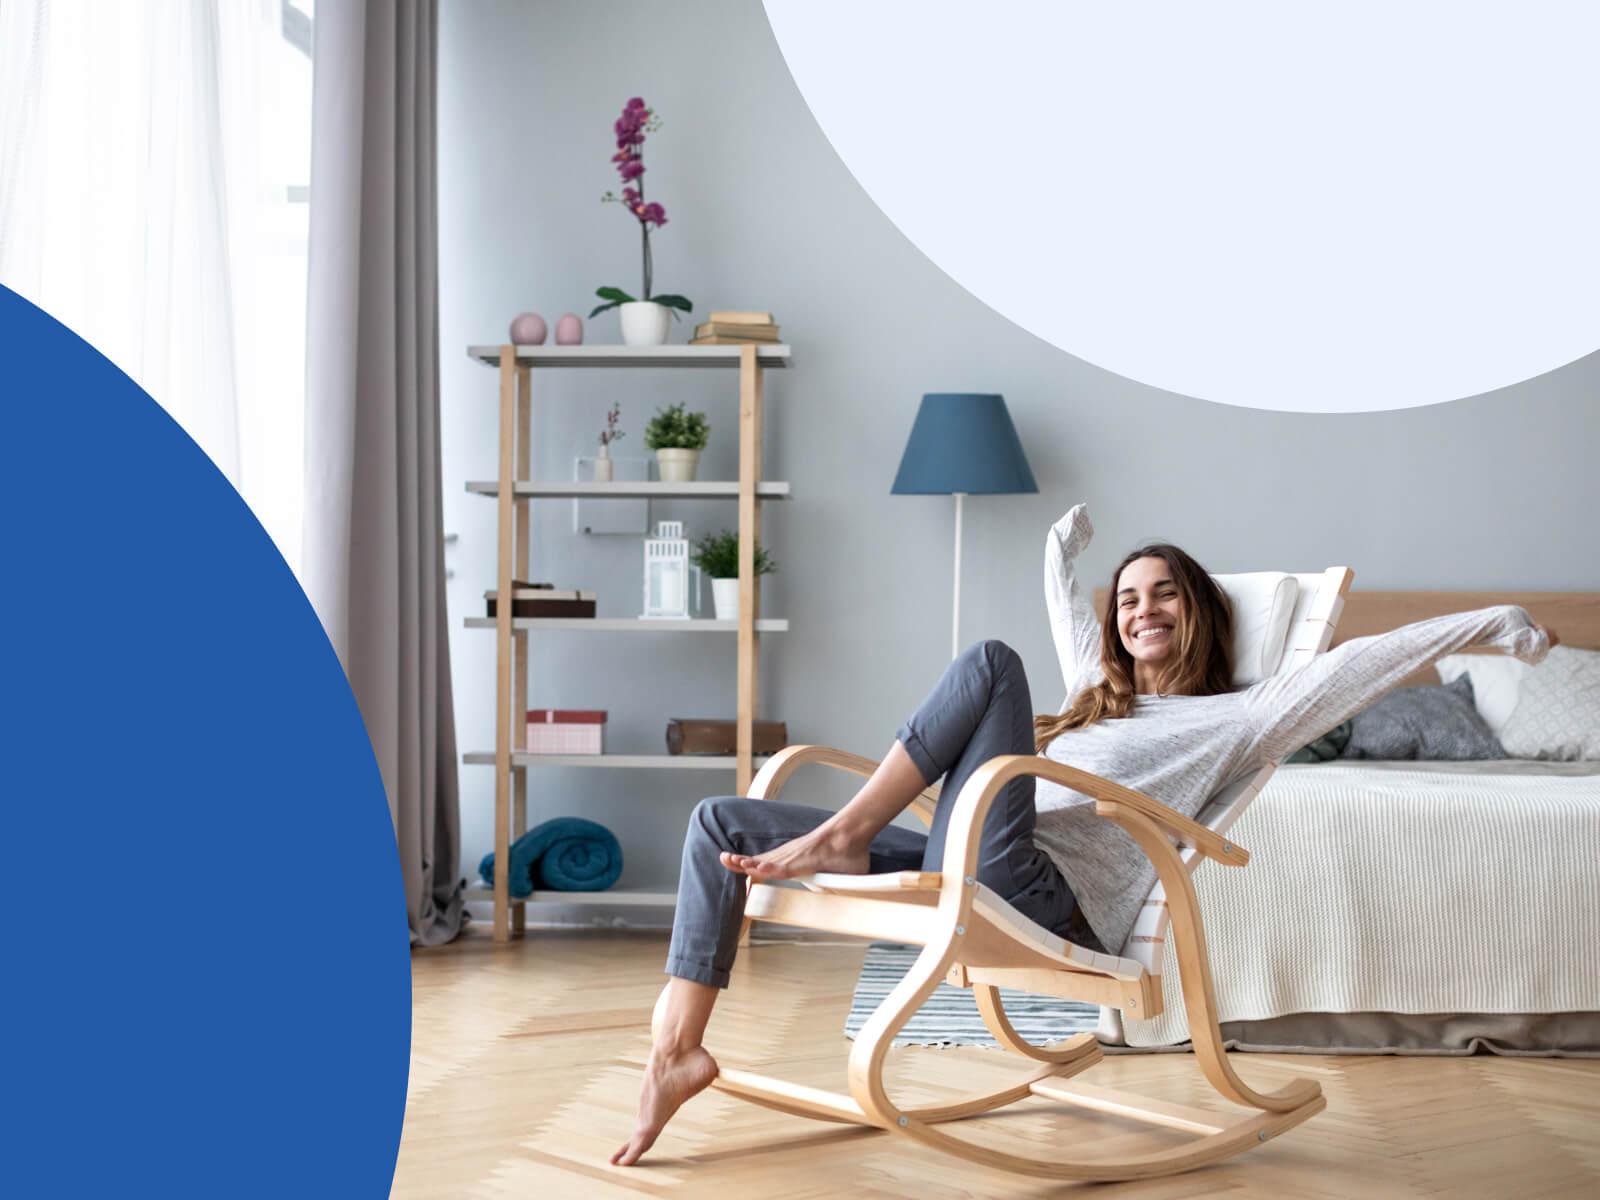 immagine donna rilassata sulla poltrona